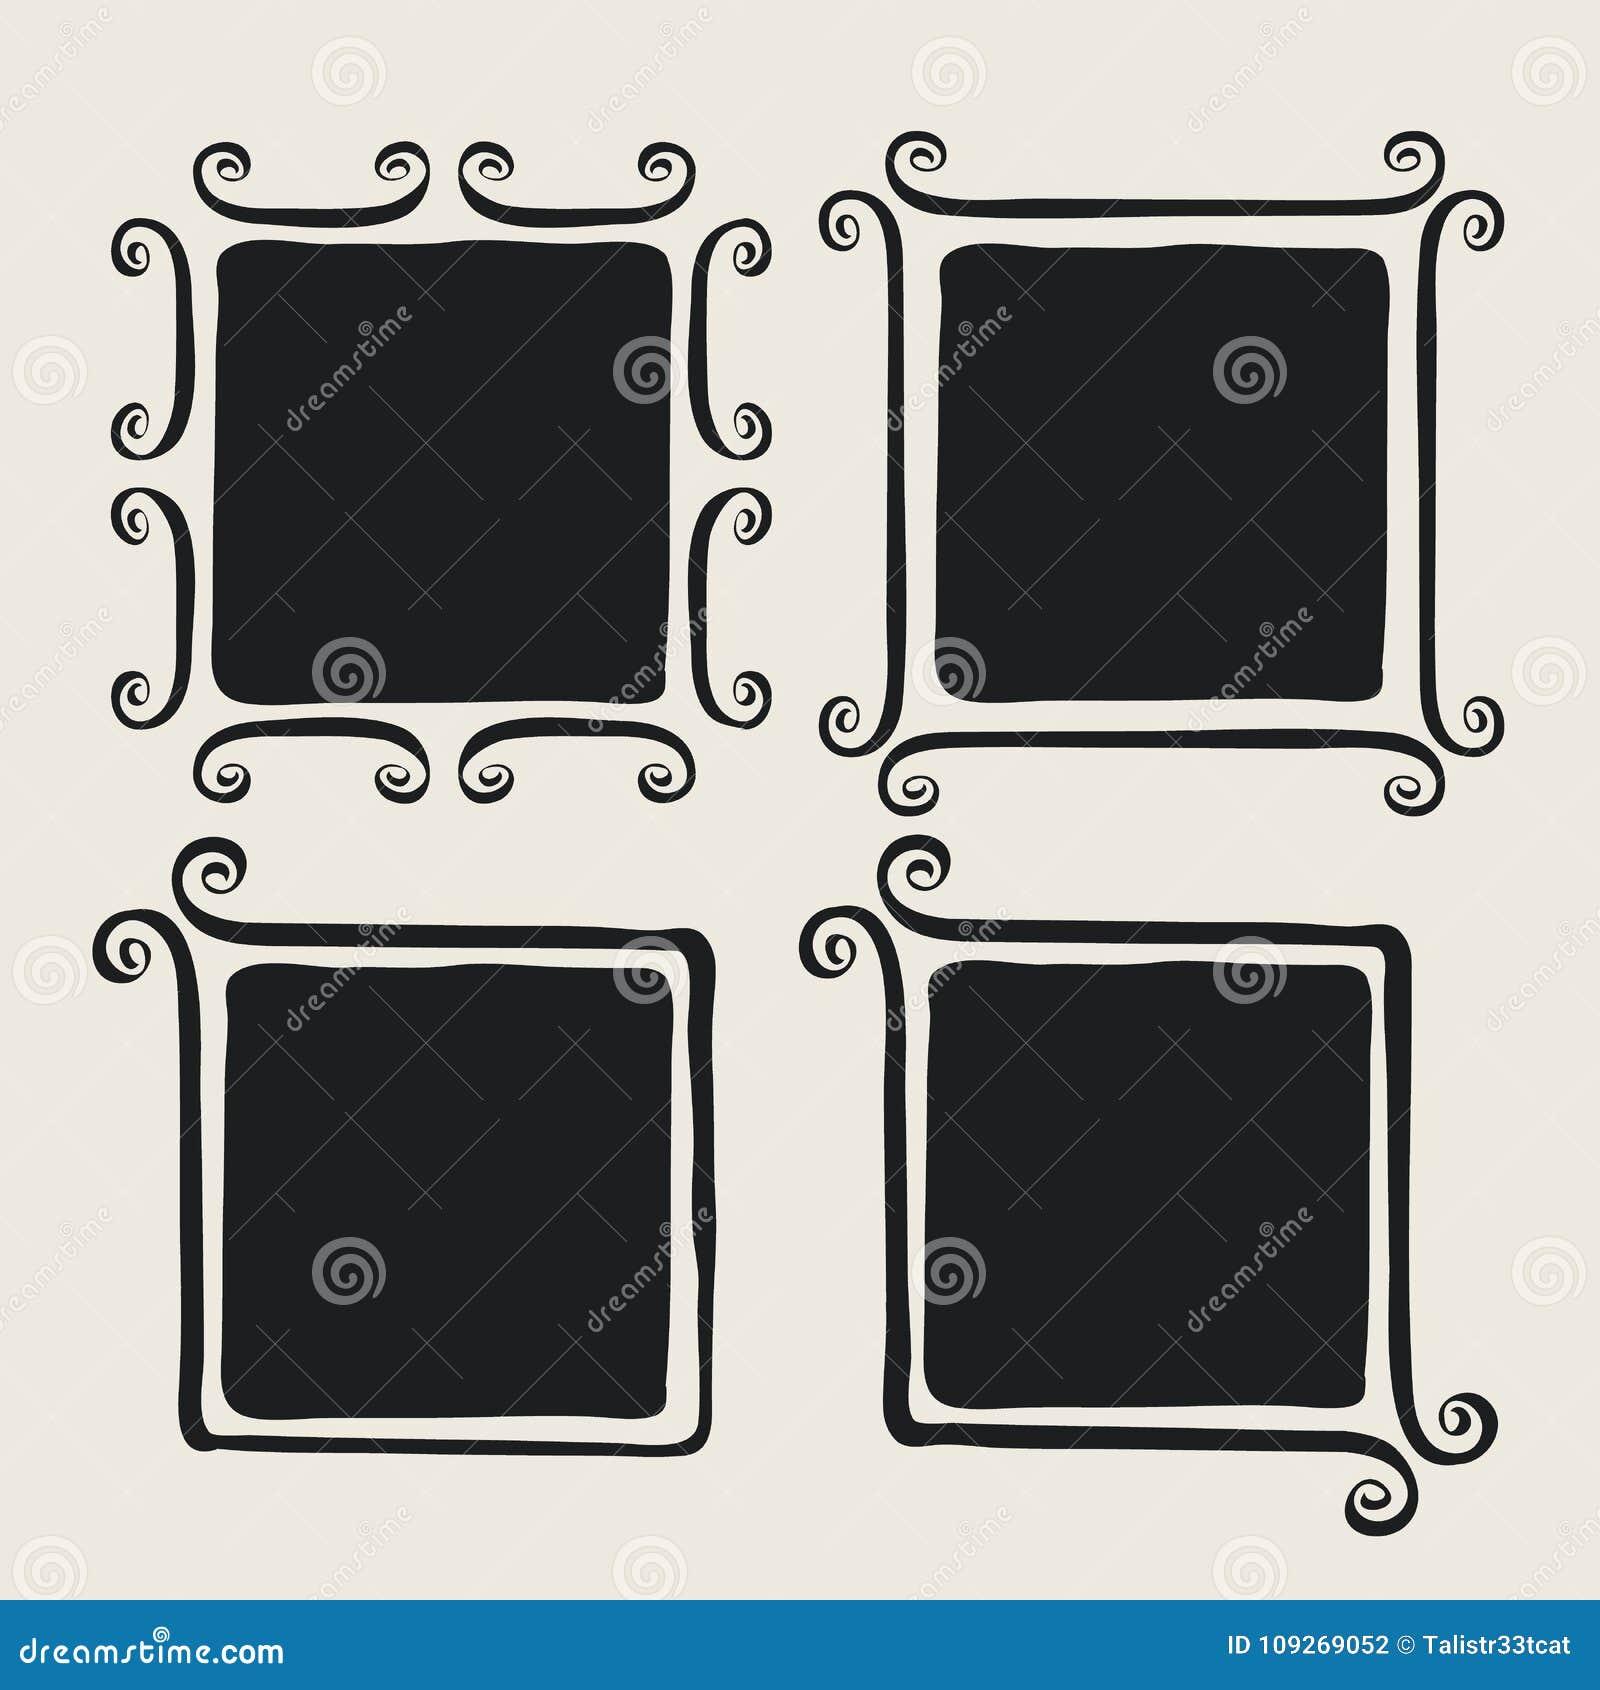 Whimsical Brush Painted Frames Stock Vector - Illustration of menu ...